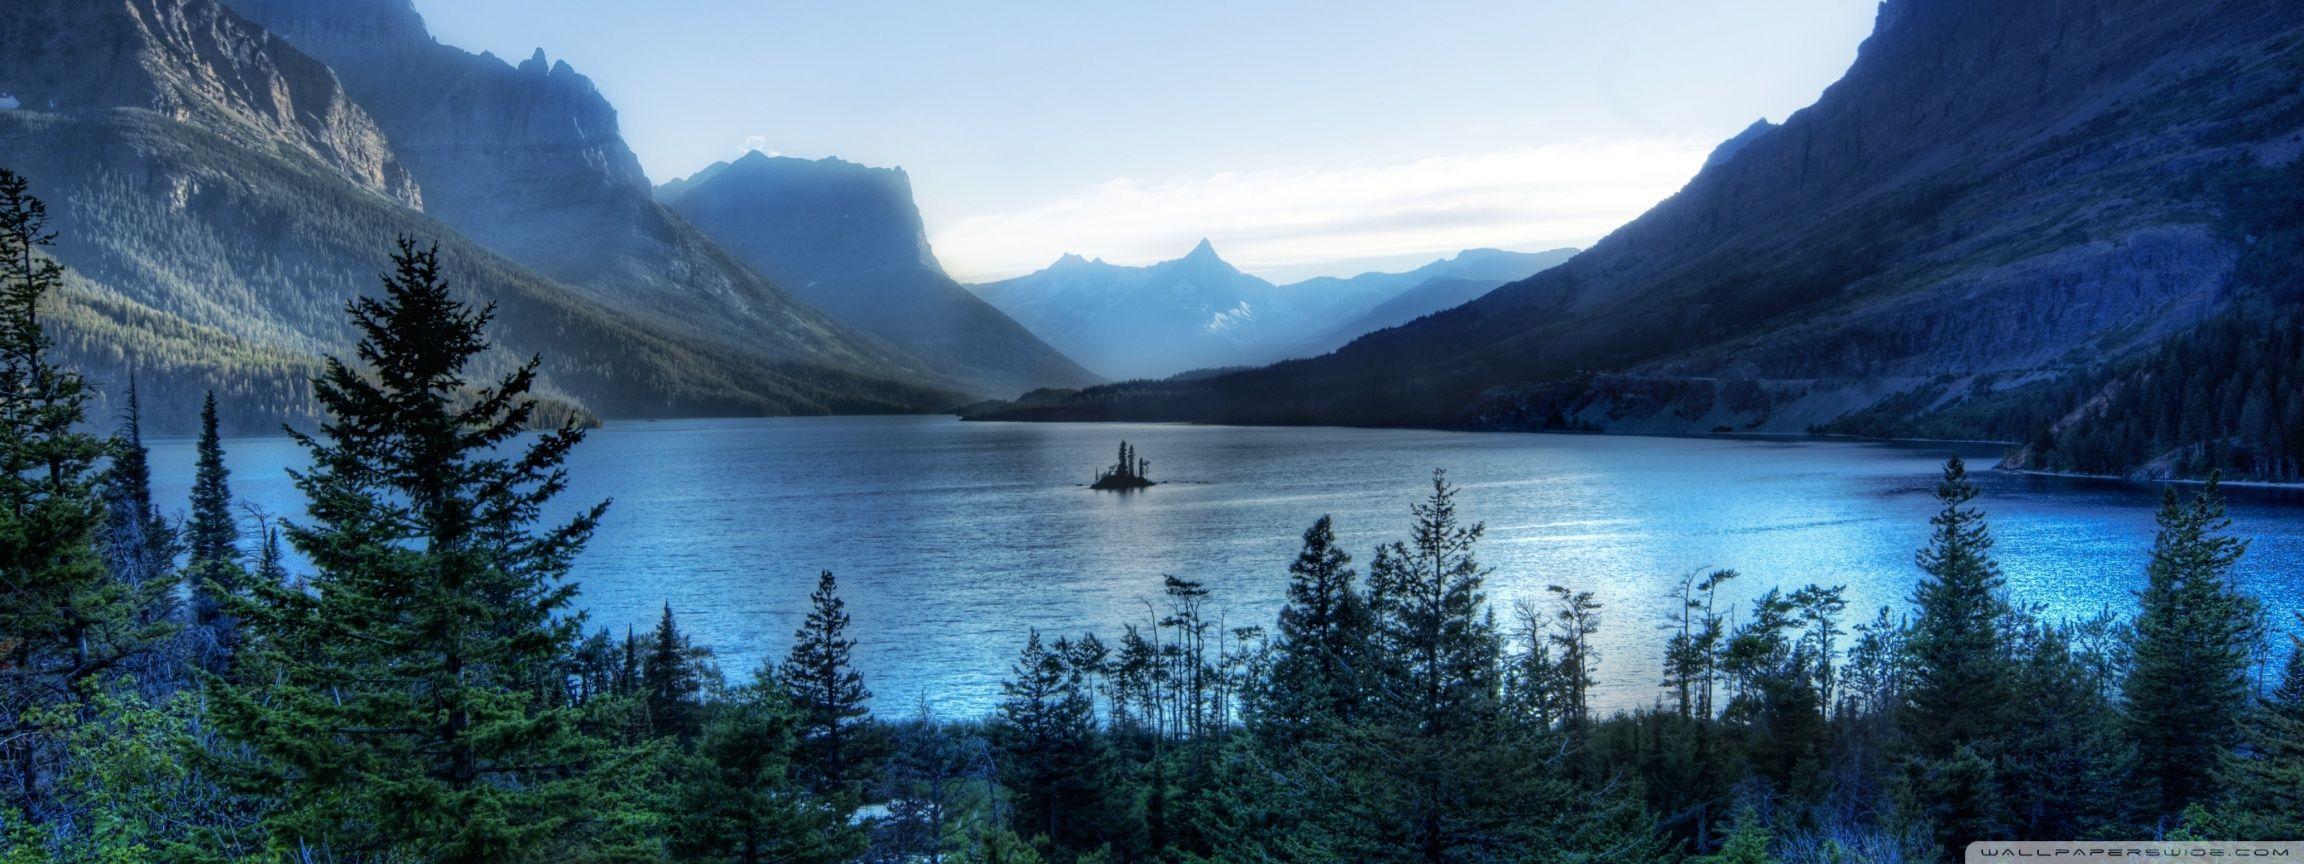 Find Out Glacier National Park Dual Monitor Wallpaper On Hdpicorner